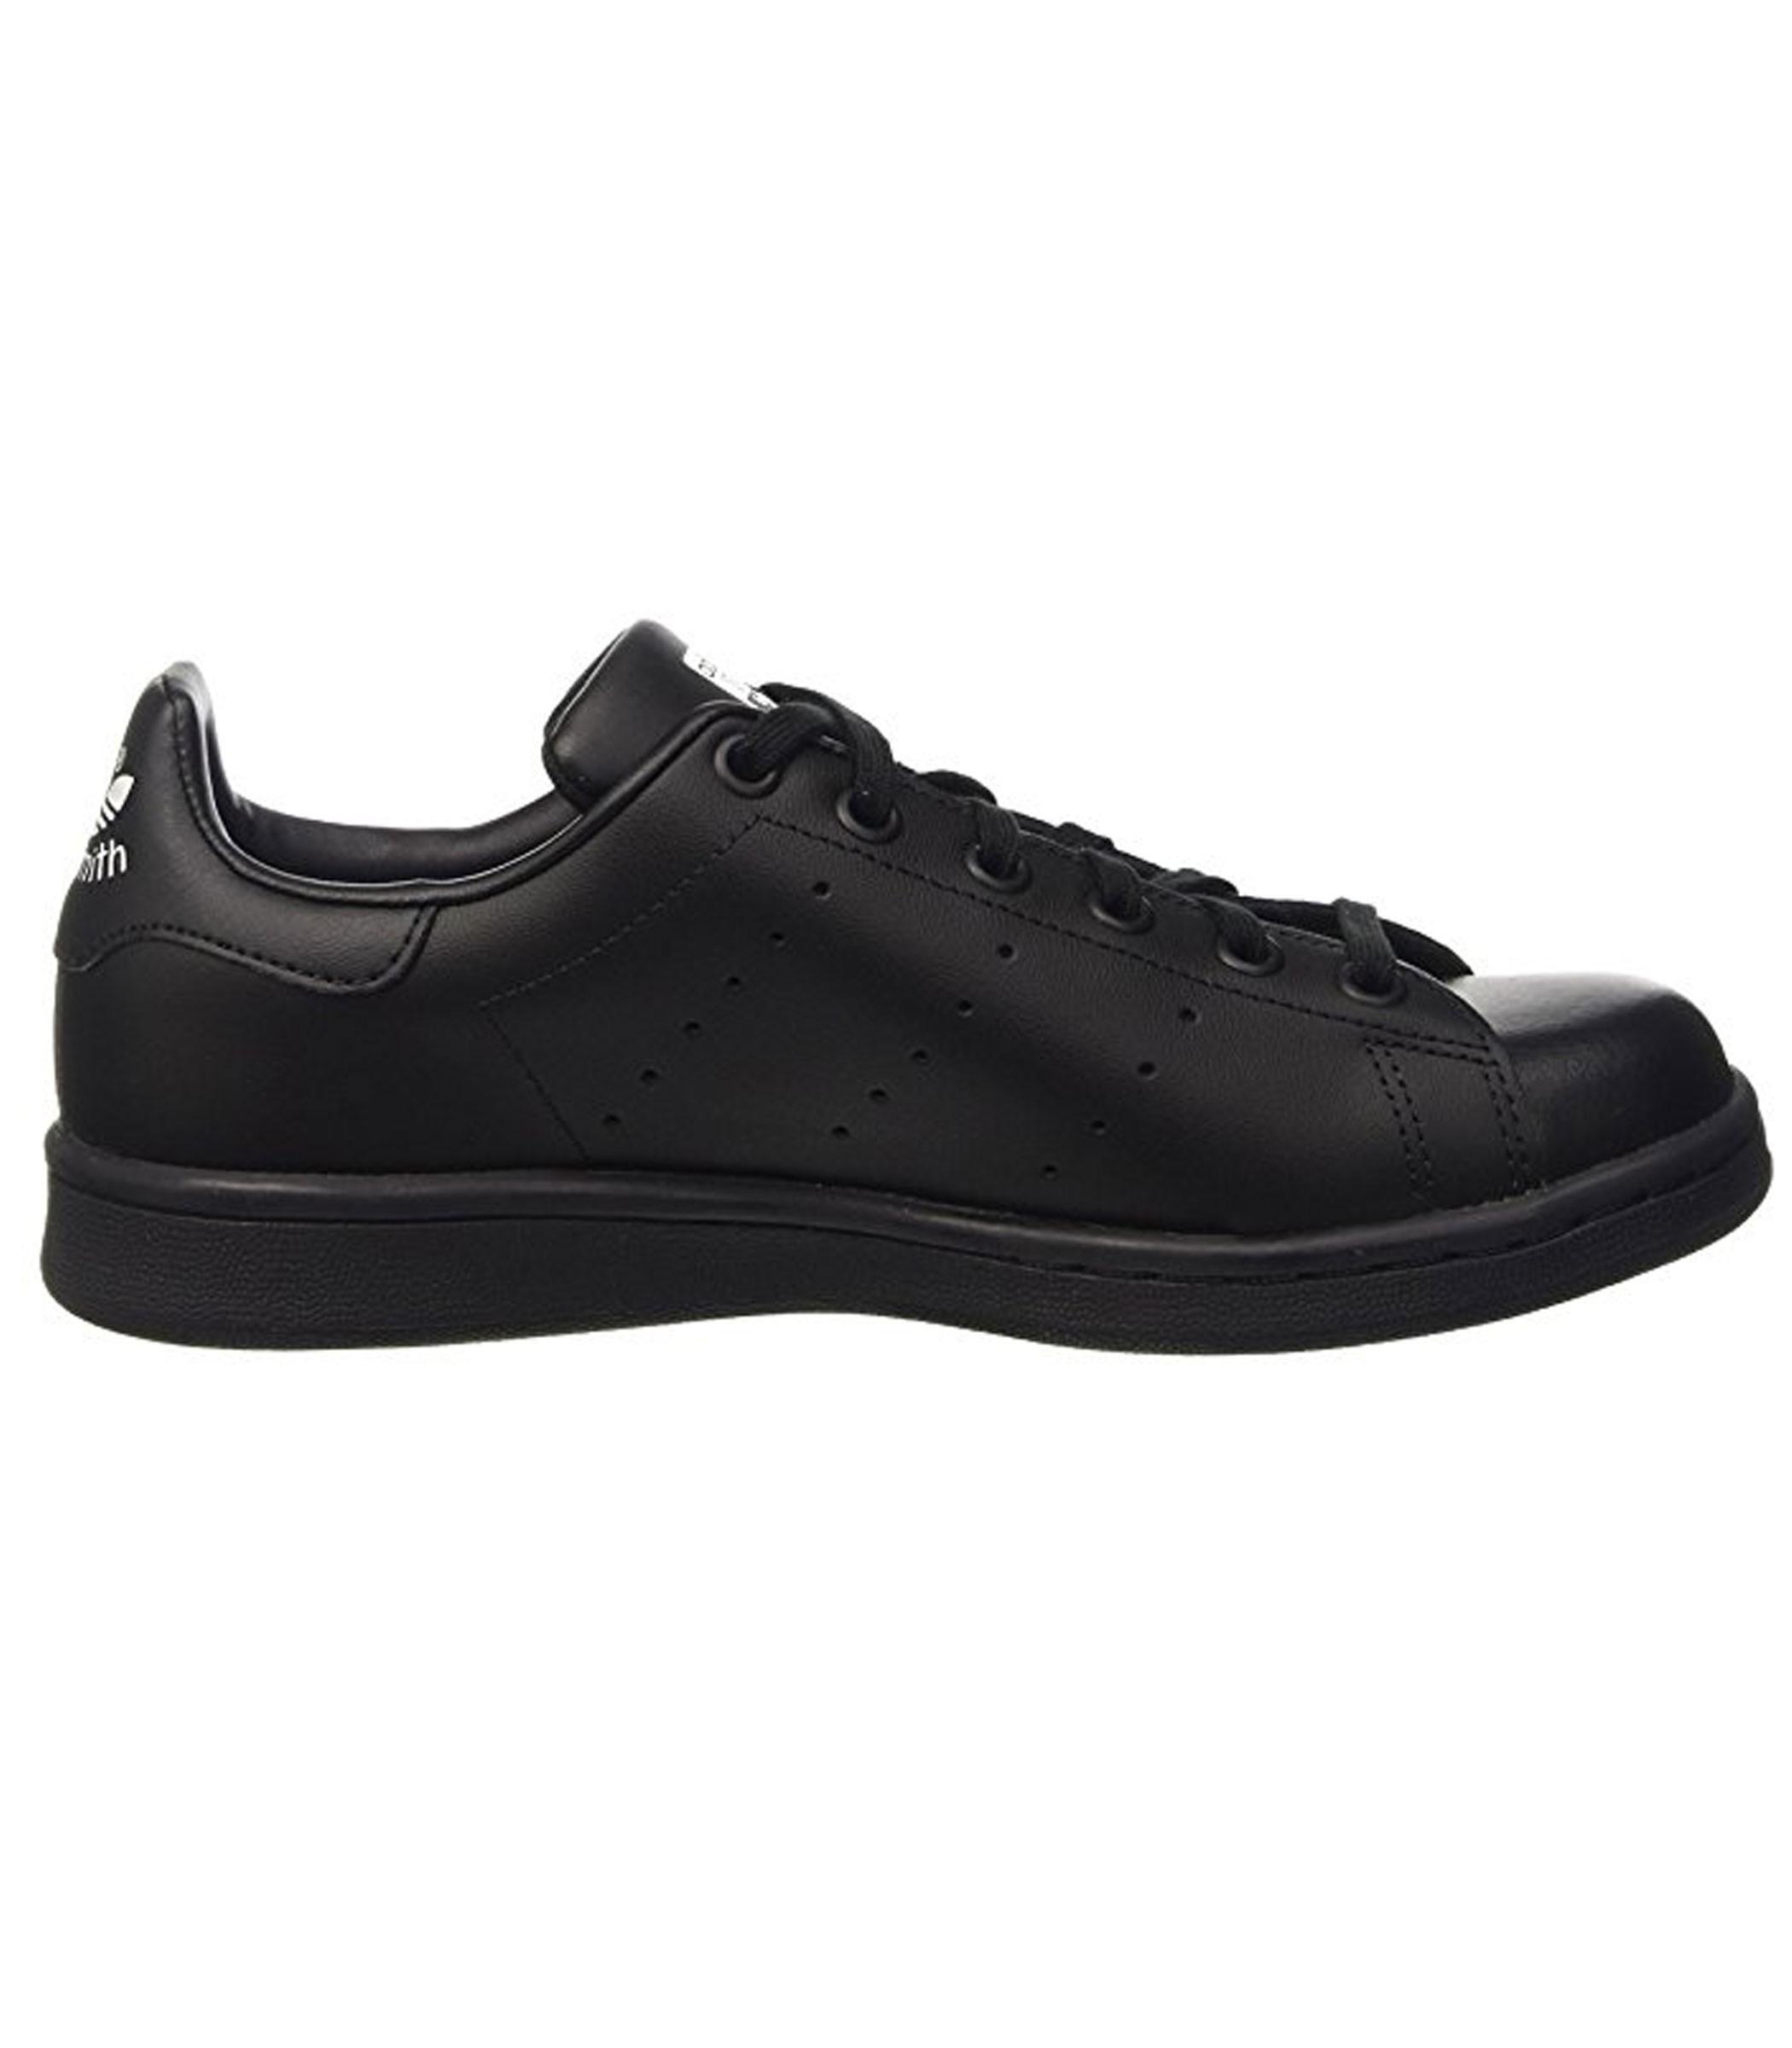 lower price with a4eb3 9b349 Scarpe Sportive Adidas Stan Smith - Donna rif. M20604